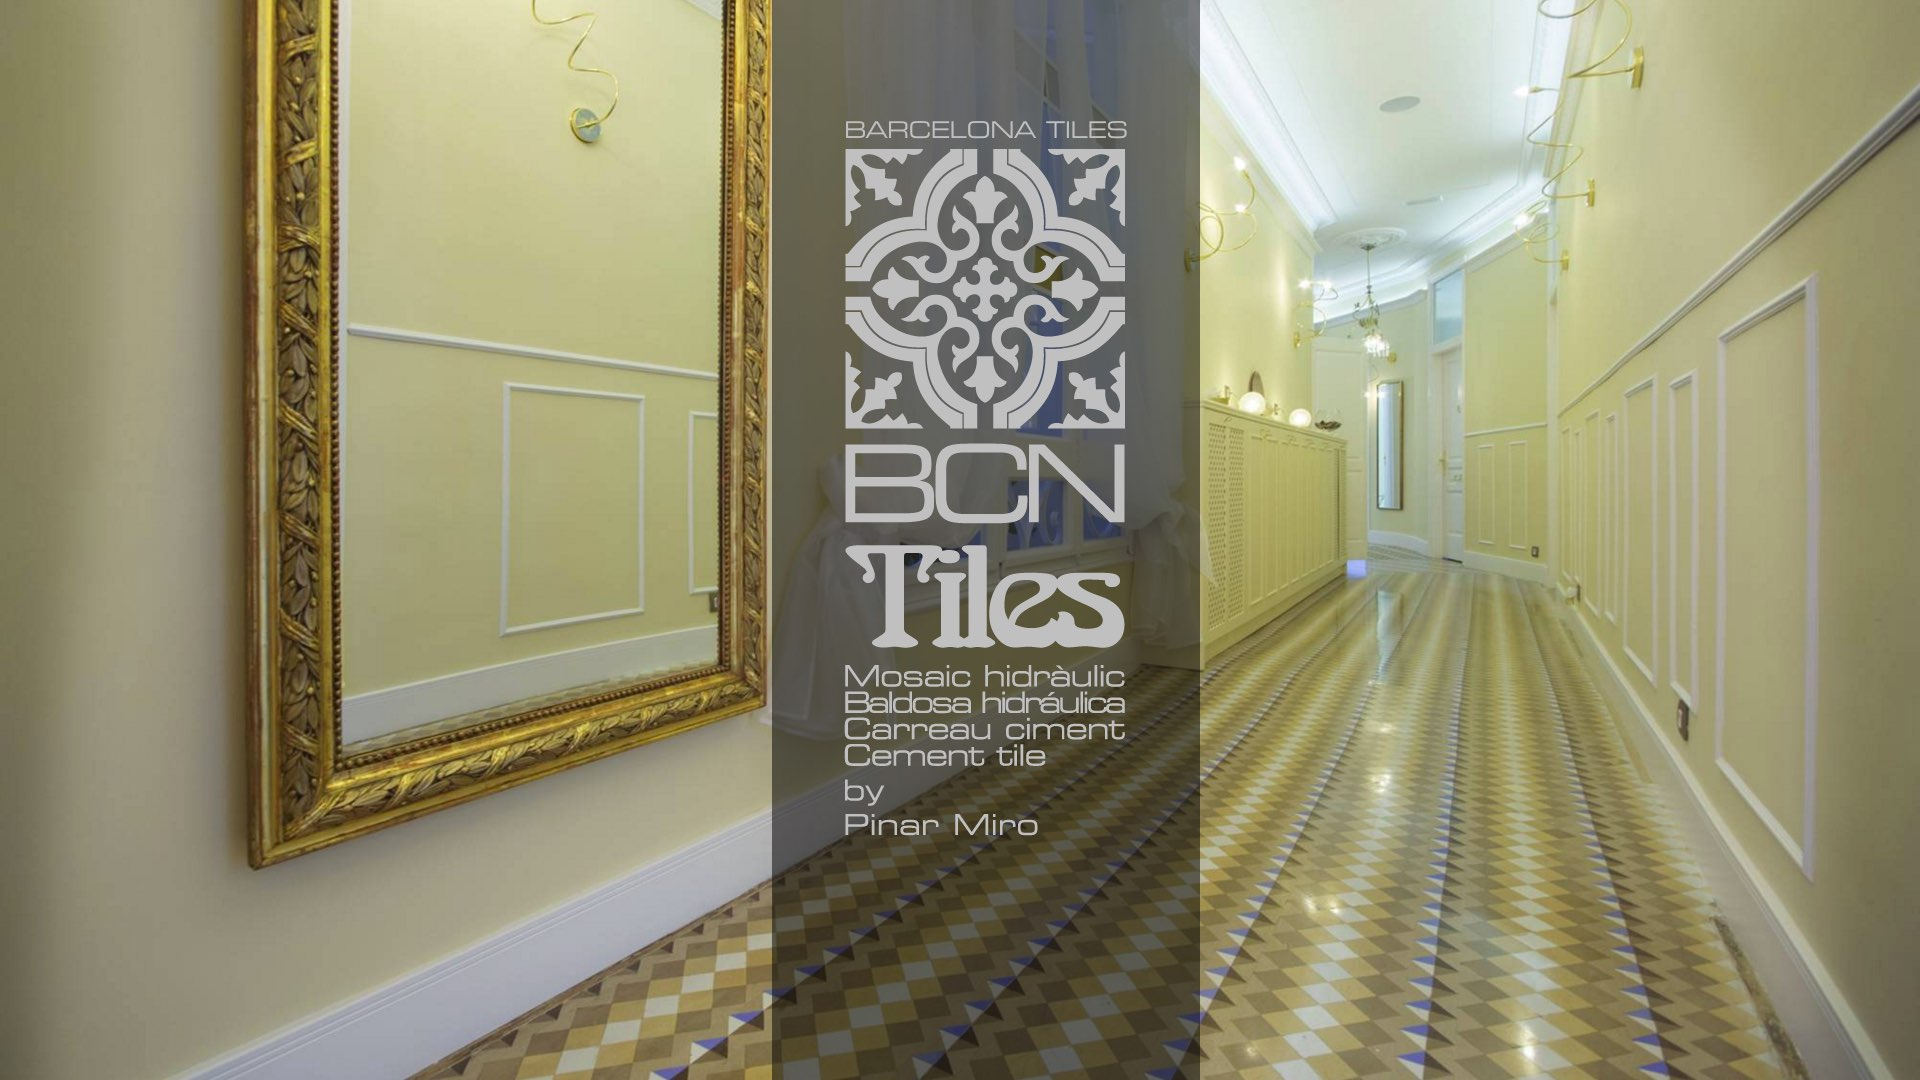 Barcelona-tiles-imagenes-inicio.001